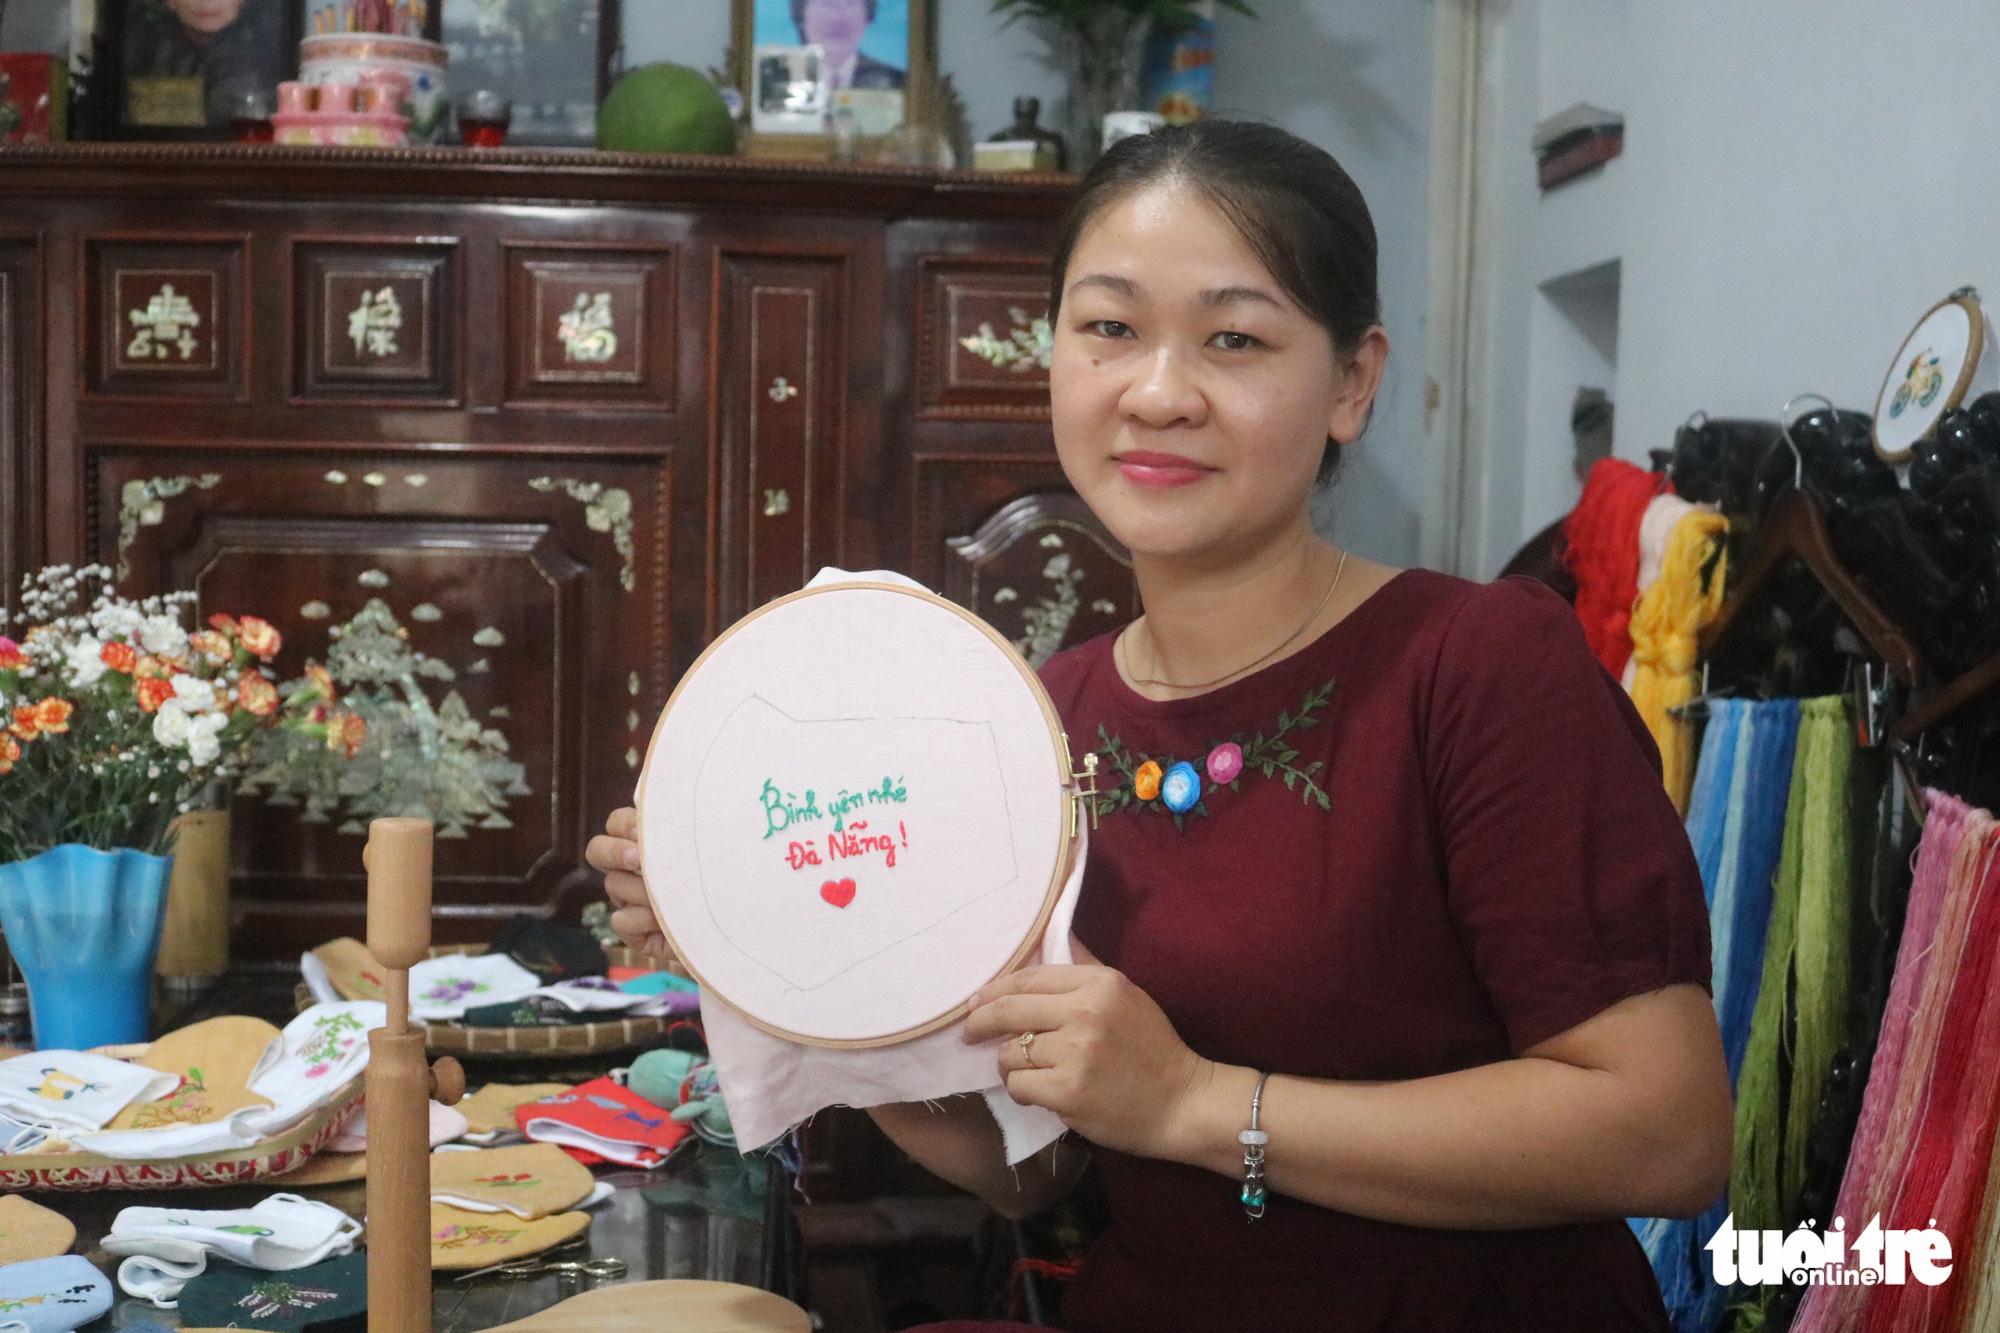 Amateur embroidery artists turn masks into fashion items amid coronavirus pandemic in Vietnam